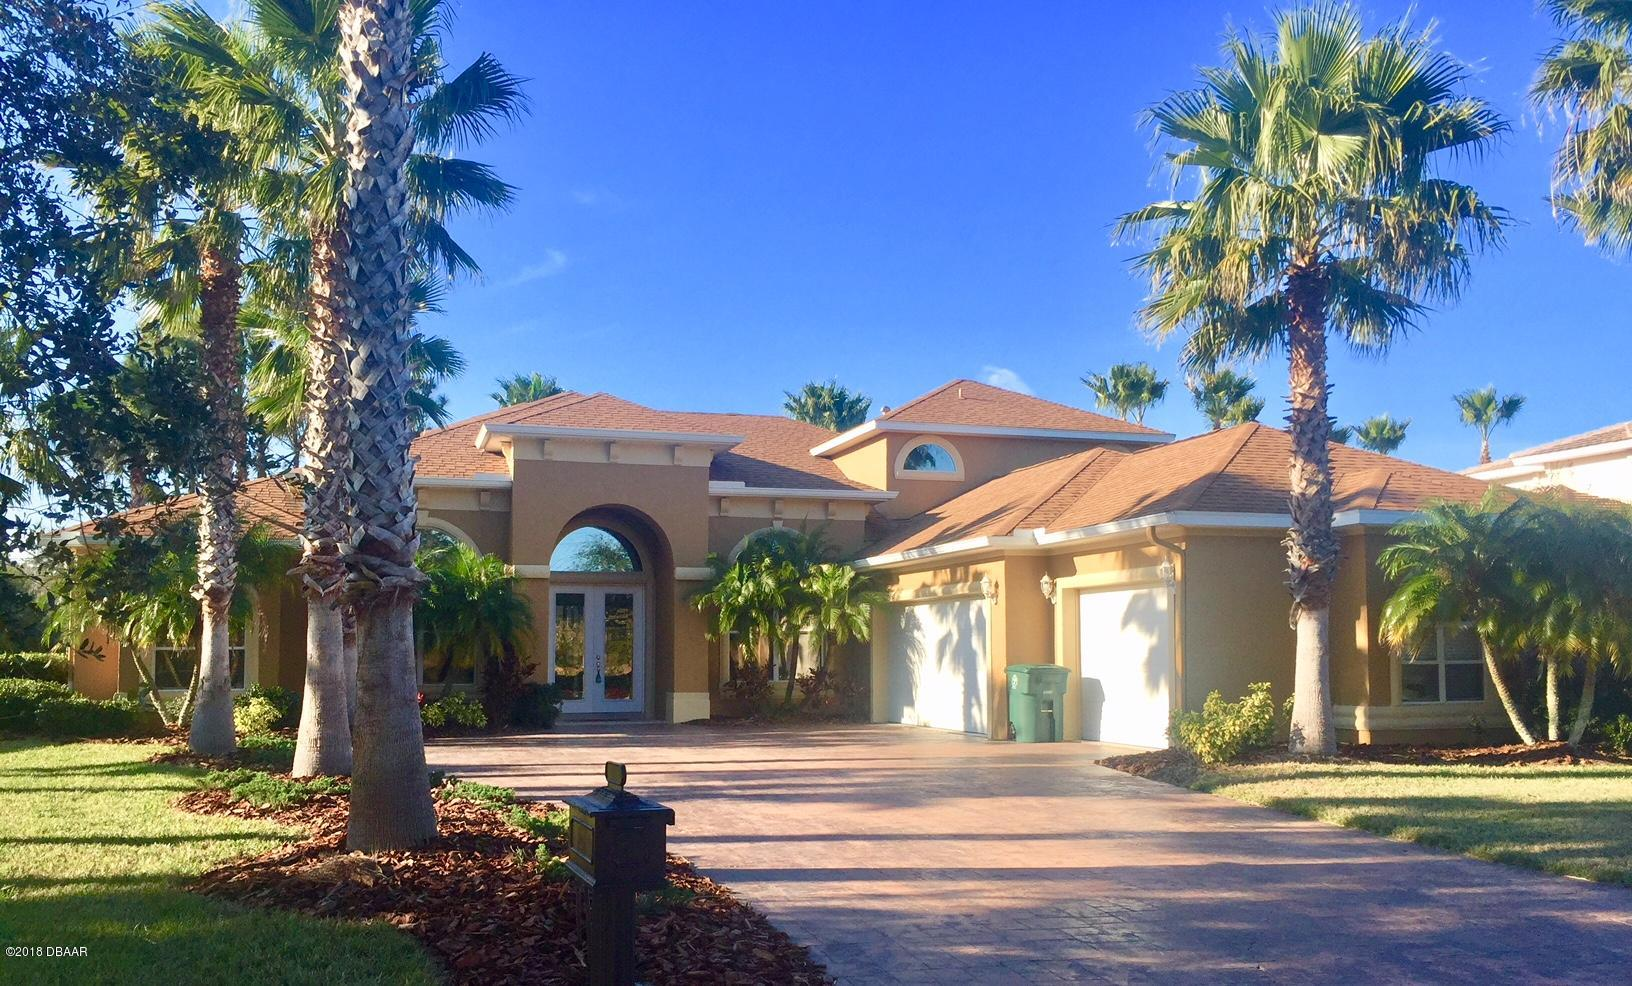 27  Promenade At Lionspaw, Daytona Beach, Florida